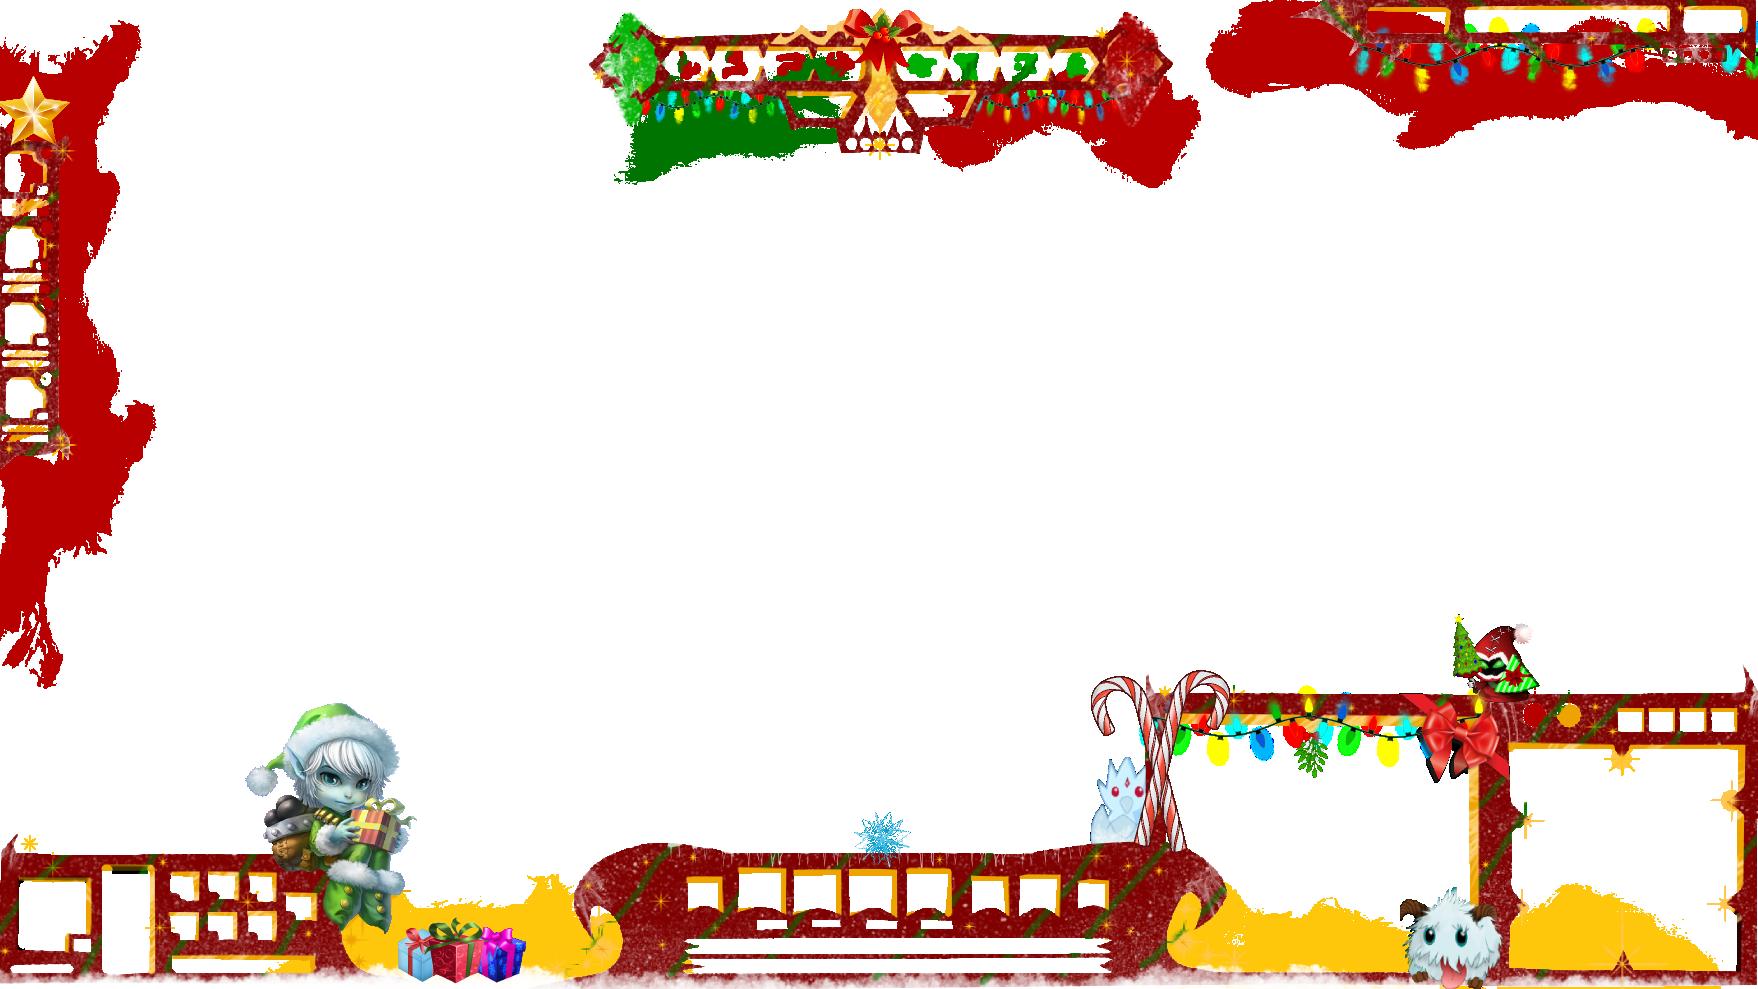 FREE overlay for christmas tristana poro by adream0fsin on DeviantArt